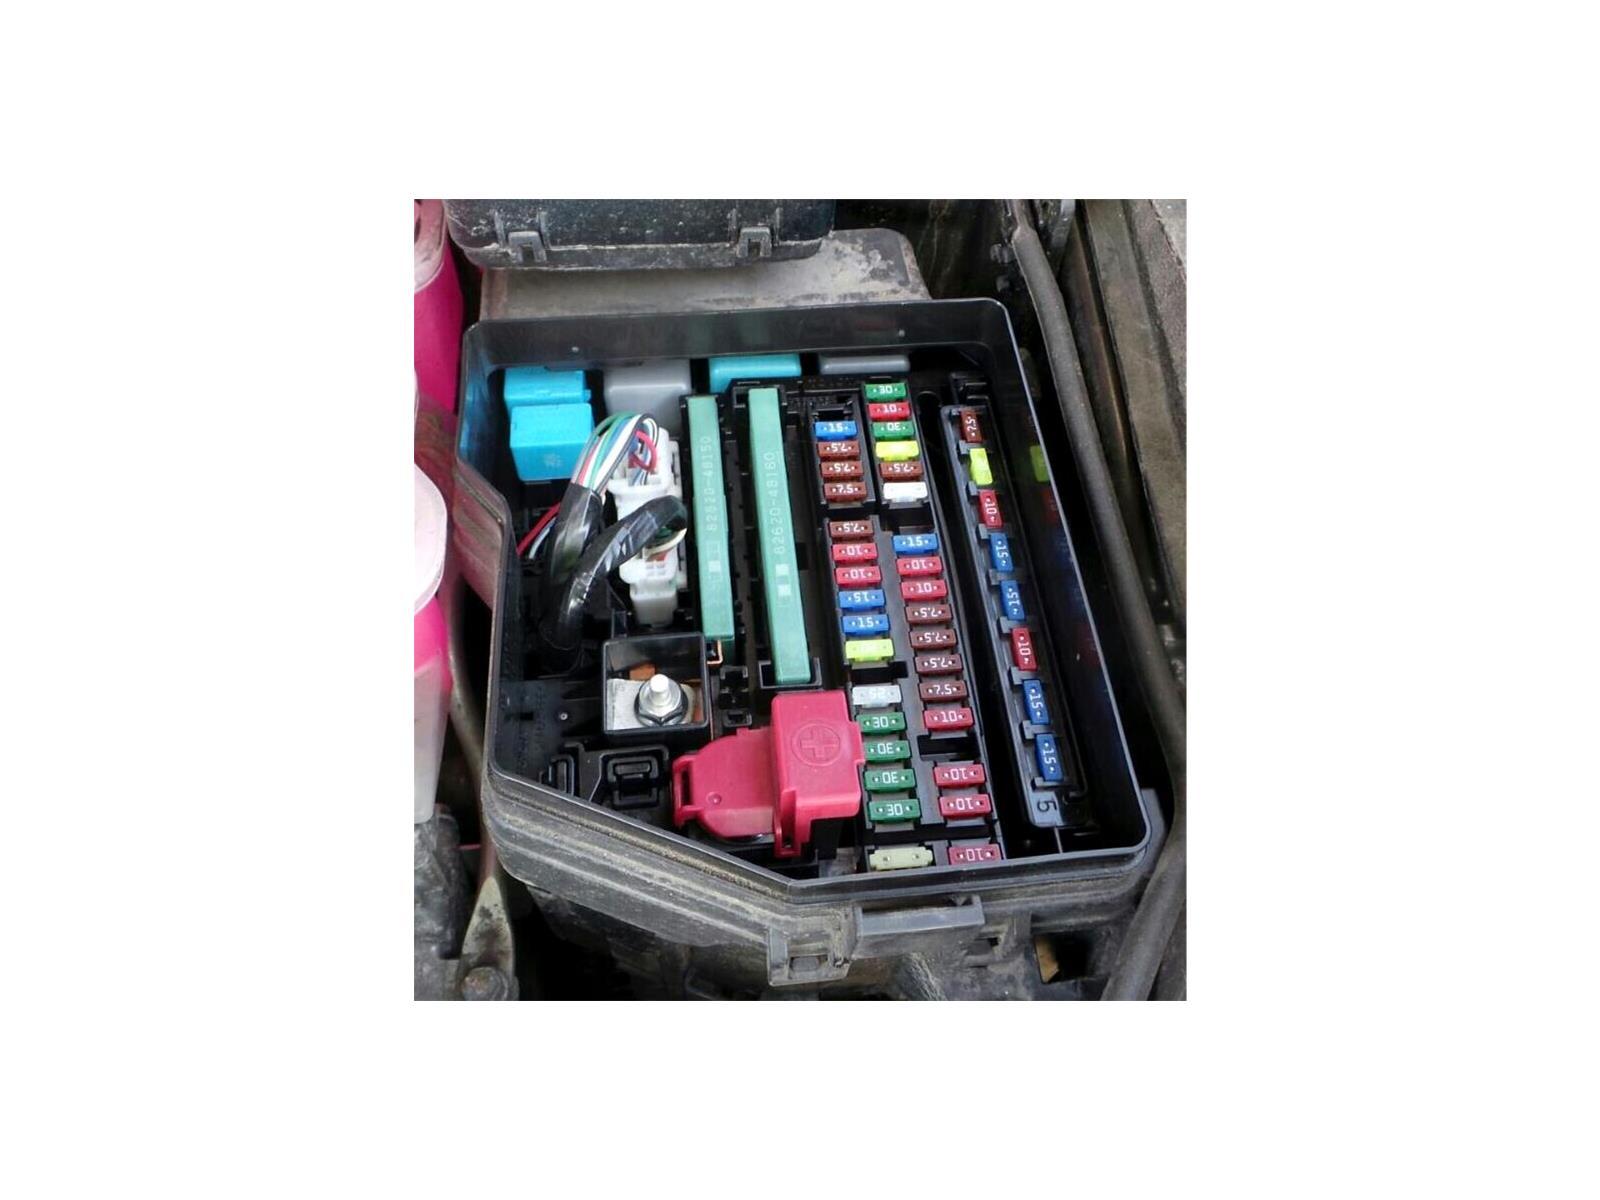 Fuse Box Lexus Gs 450h Electrical Wiring Diagrams Gs350 Rx Diagram Manual 2013